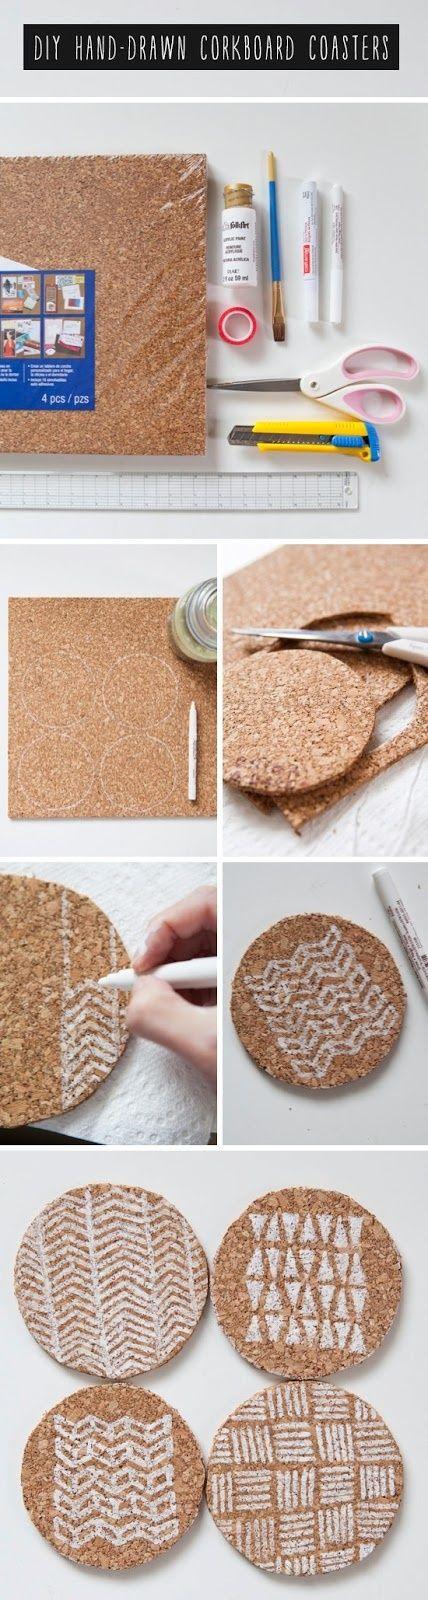 Best 25 corkboard ideas ideas on pinterest pin boards for Cork coasters for crafts